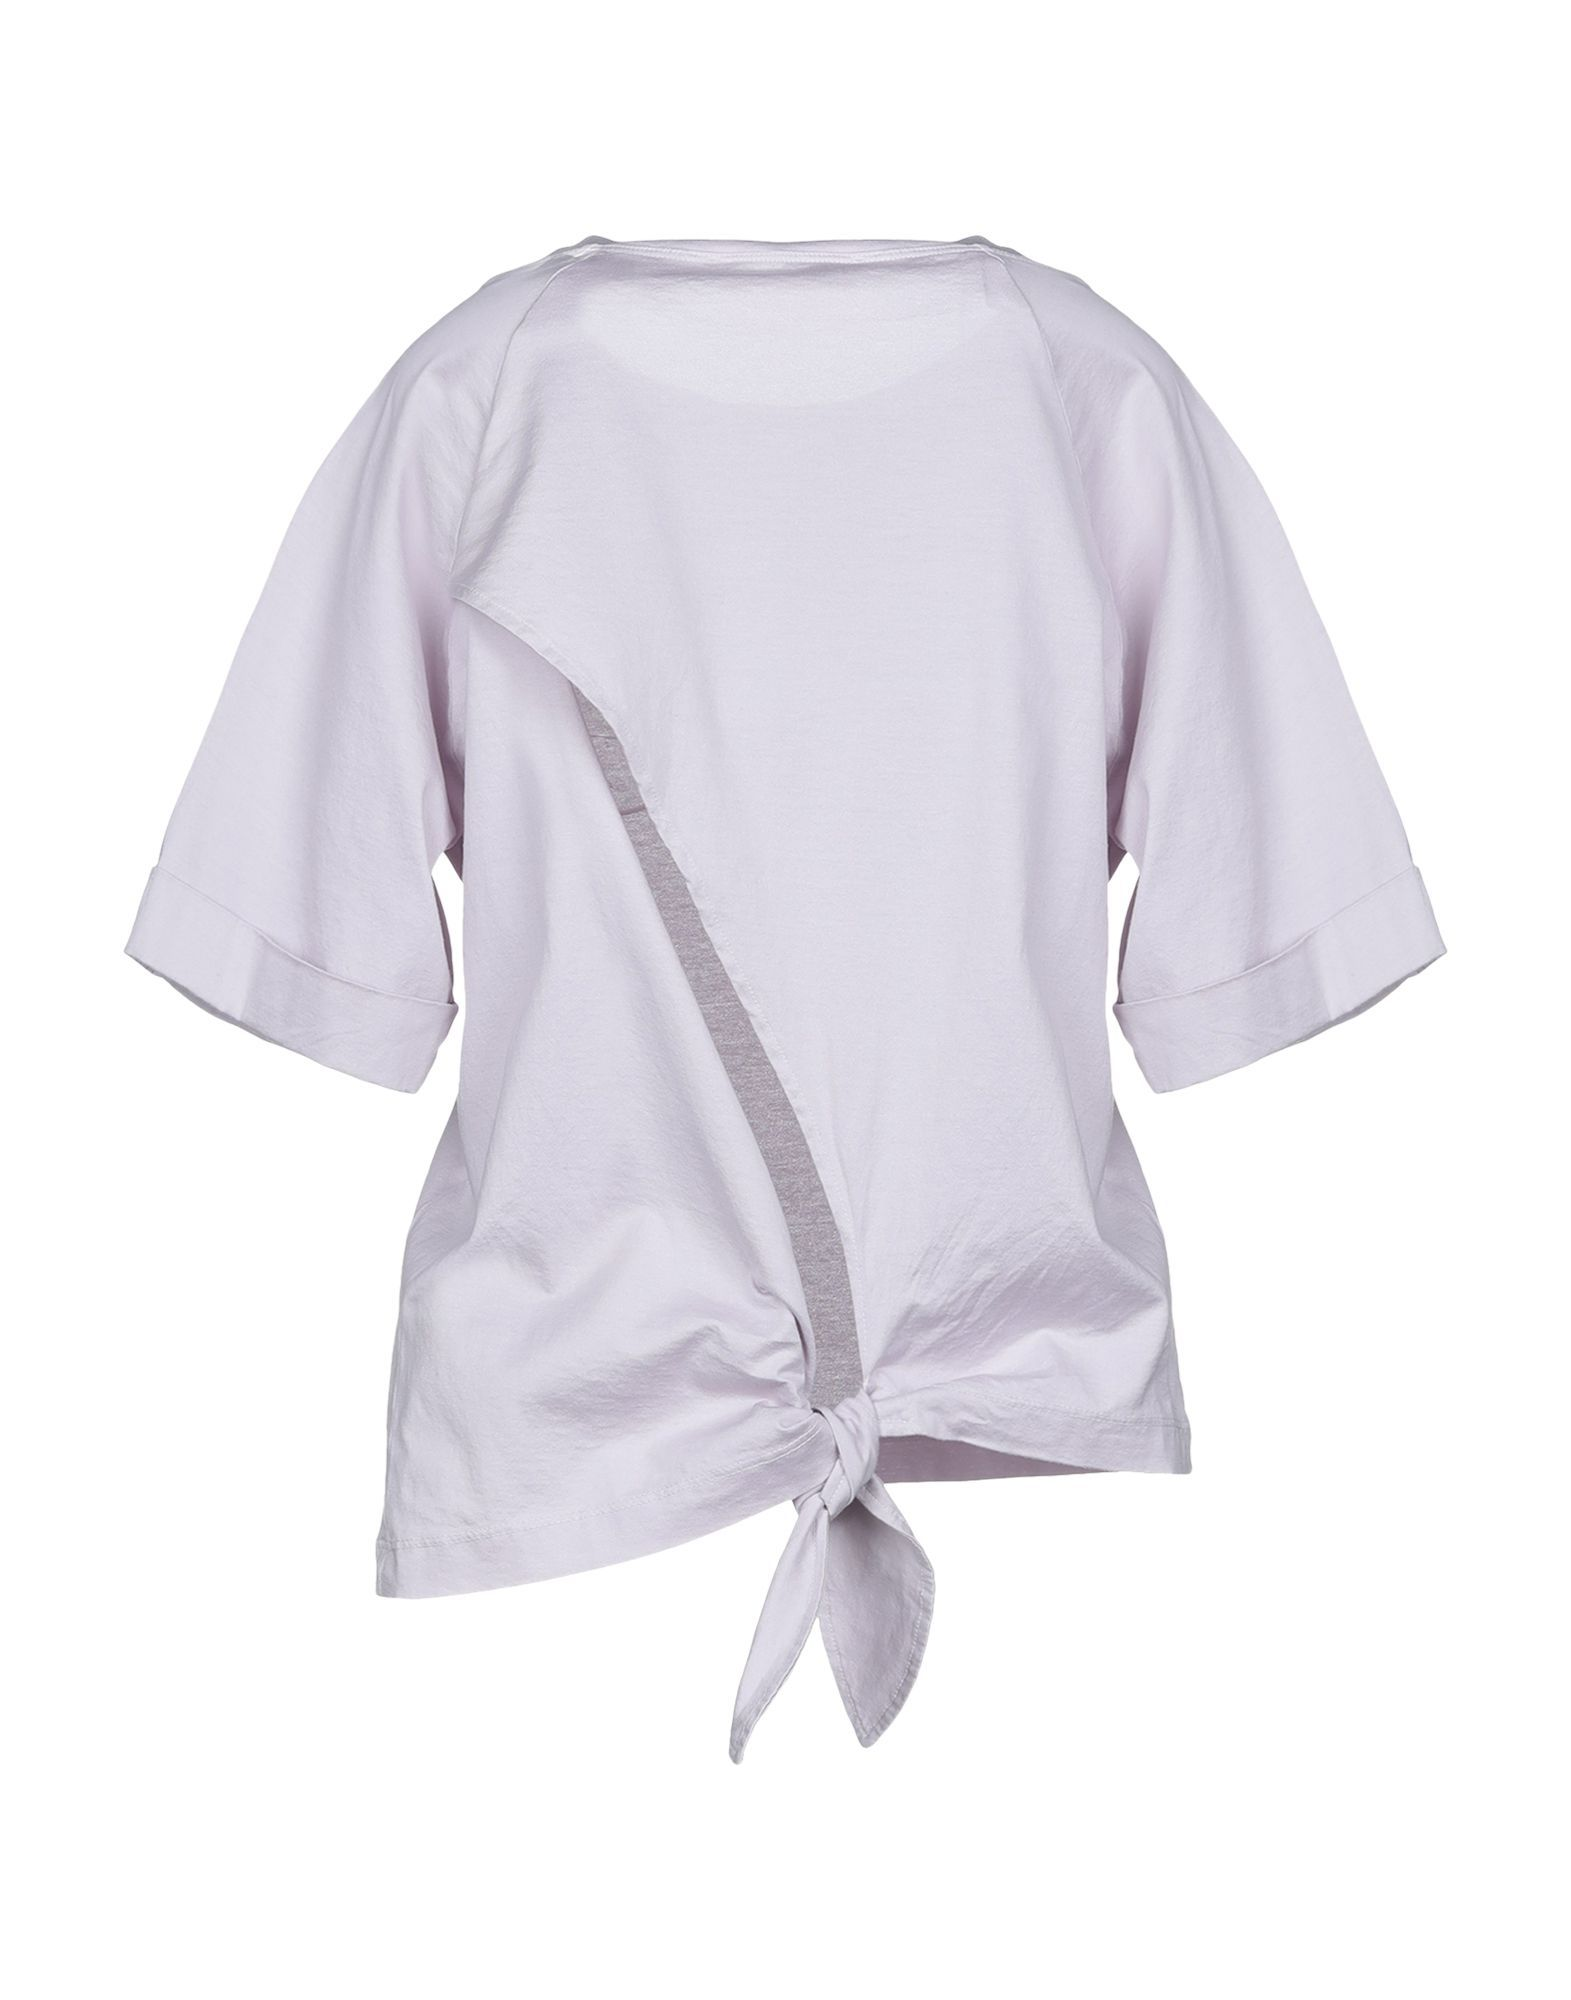 Mauro Grifoni Lilac Cotton T-Shirt